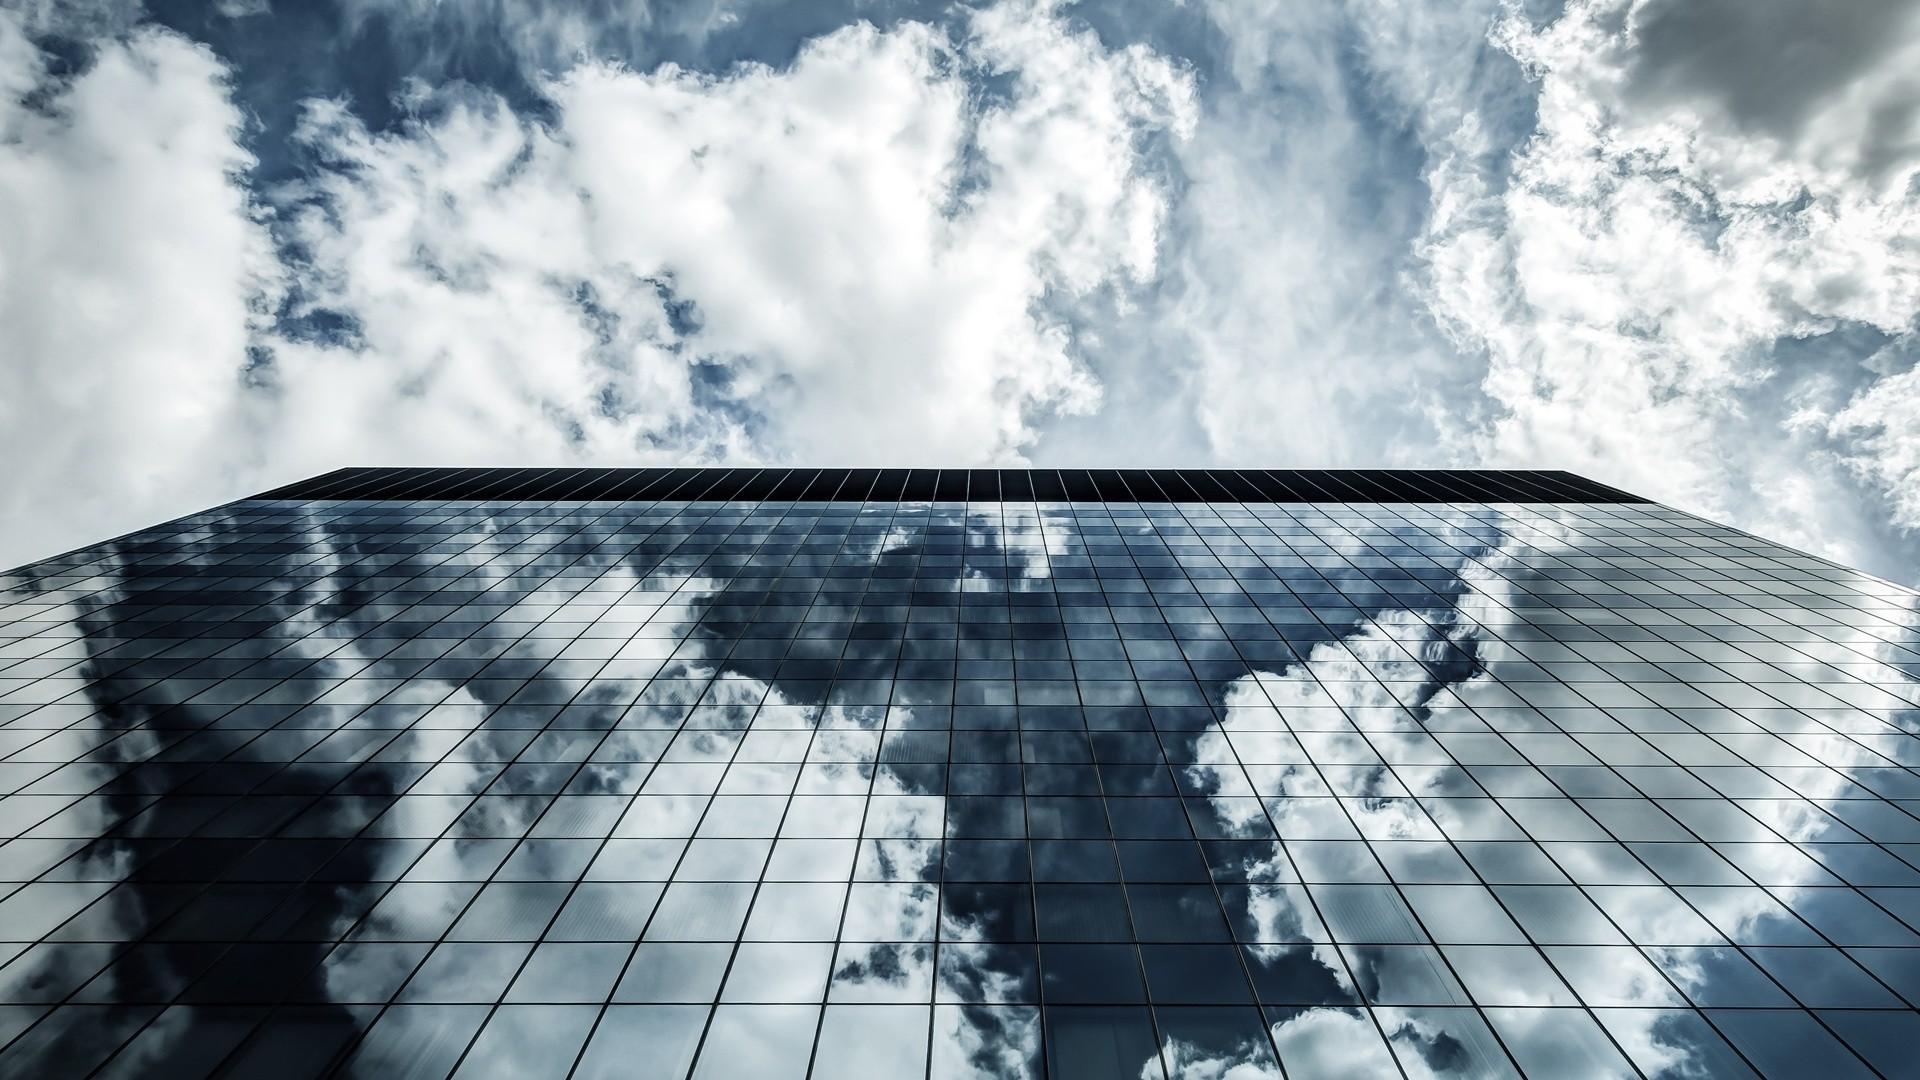 Wallpaper Sunlight Monochrome Architecture Reflection Sky